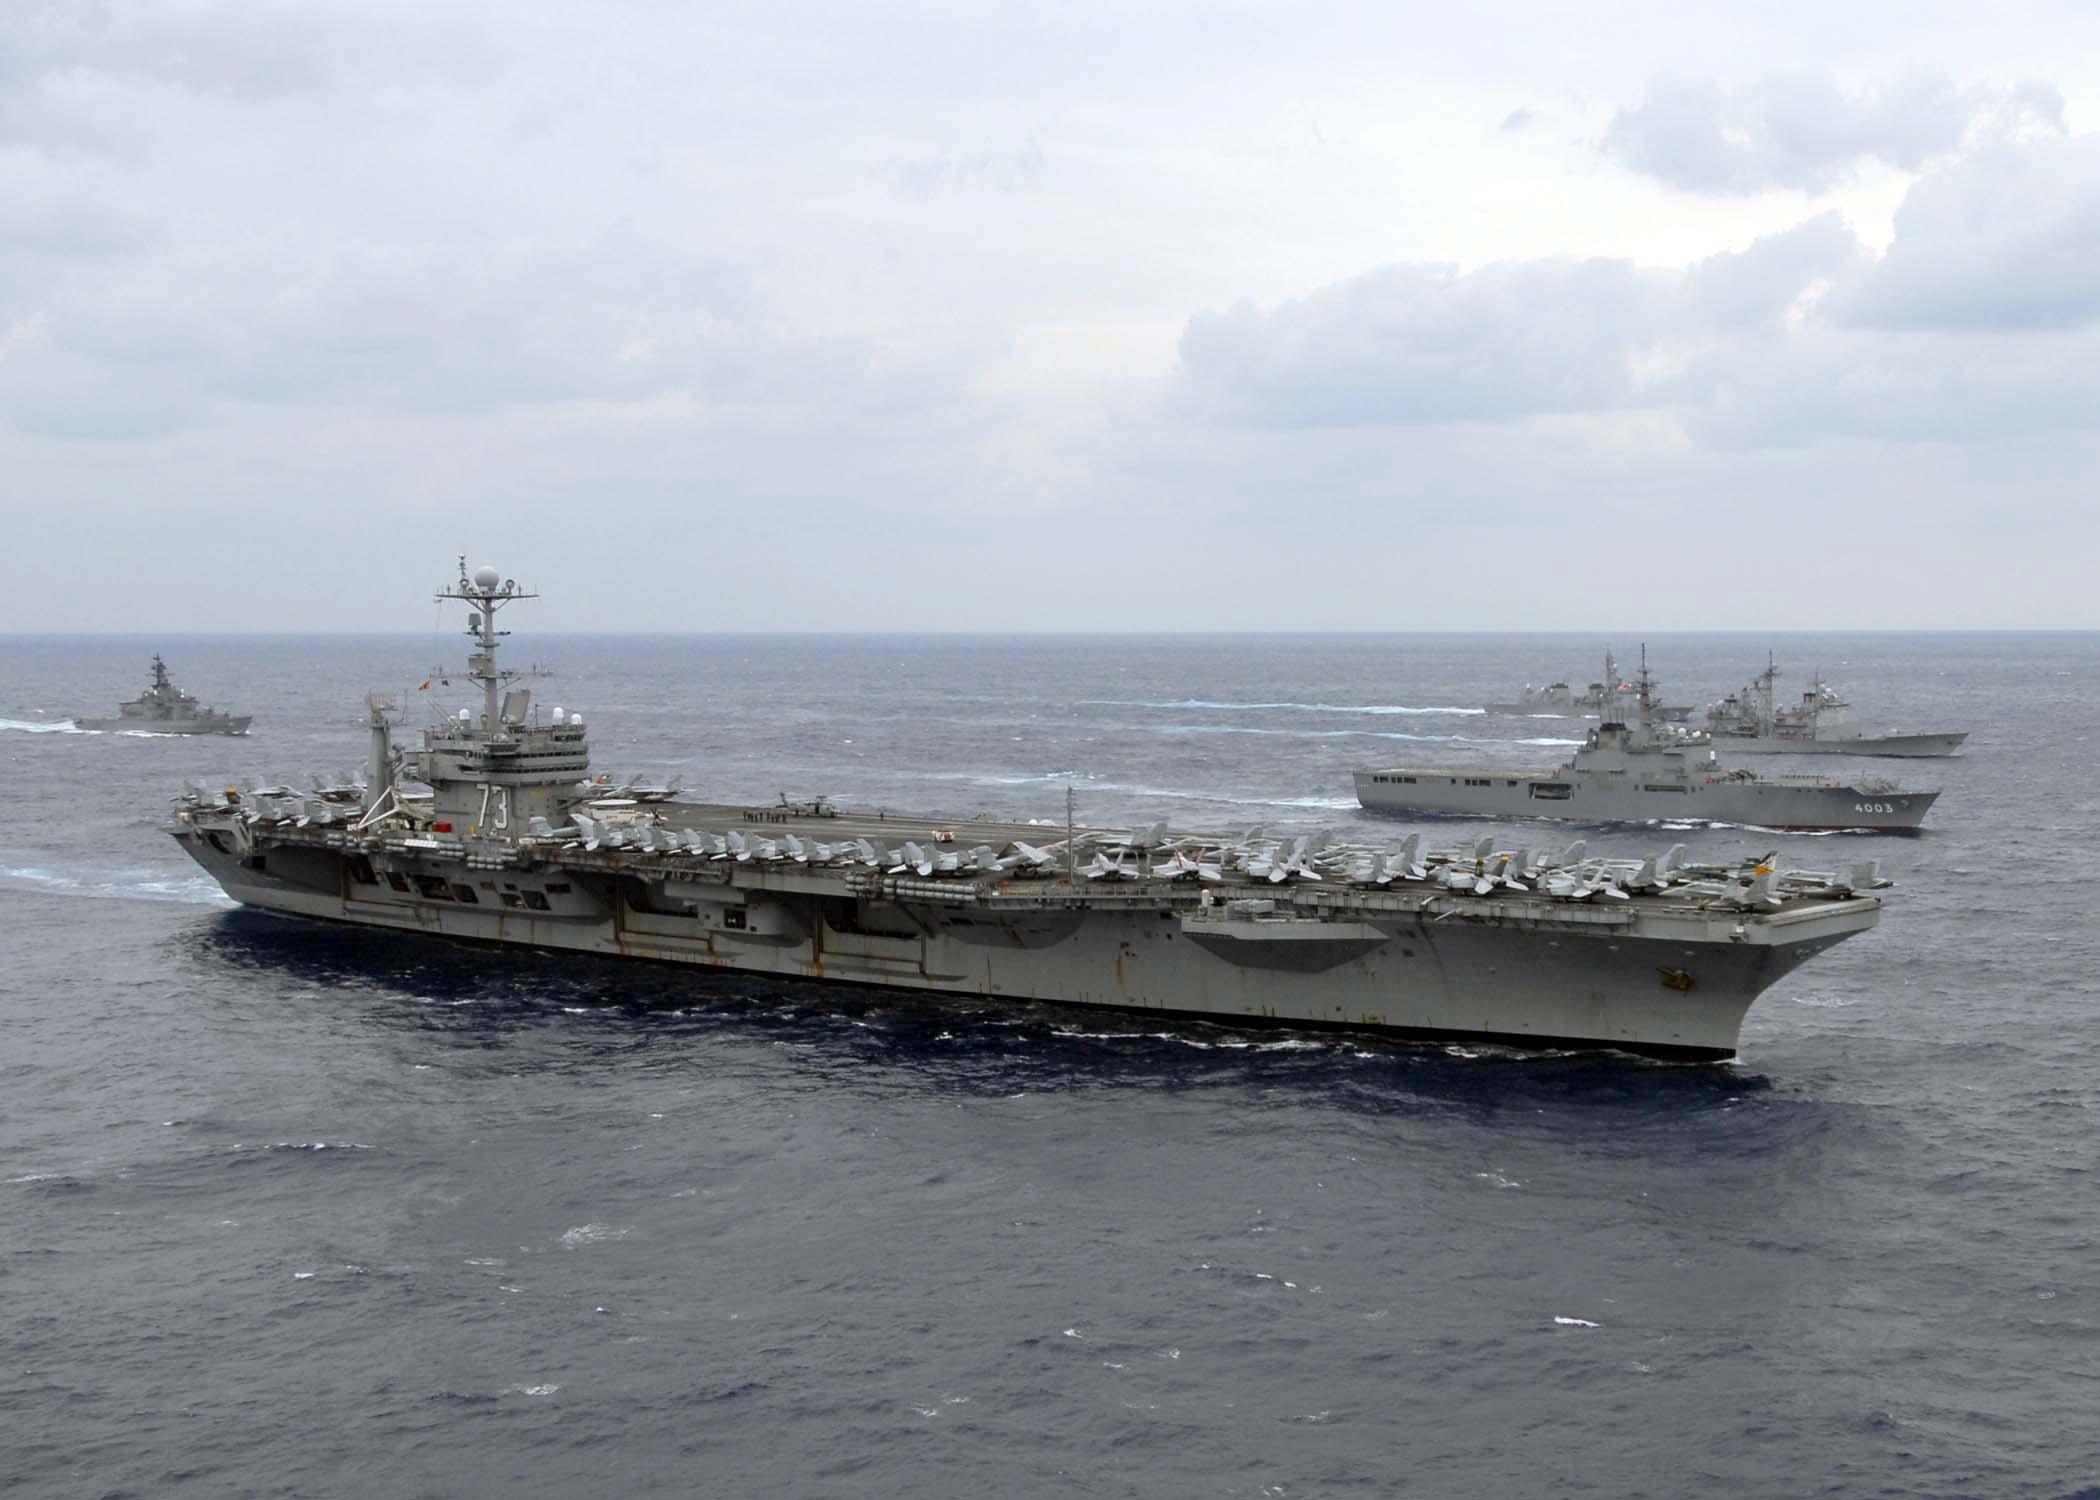 USS_George_Washington_(CVN-73)_001.jpg